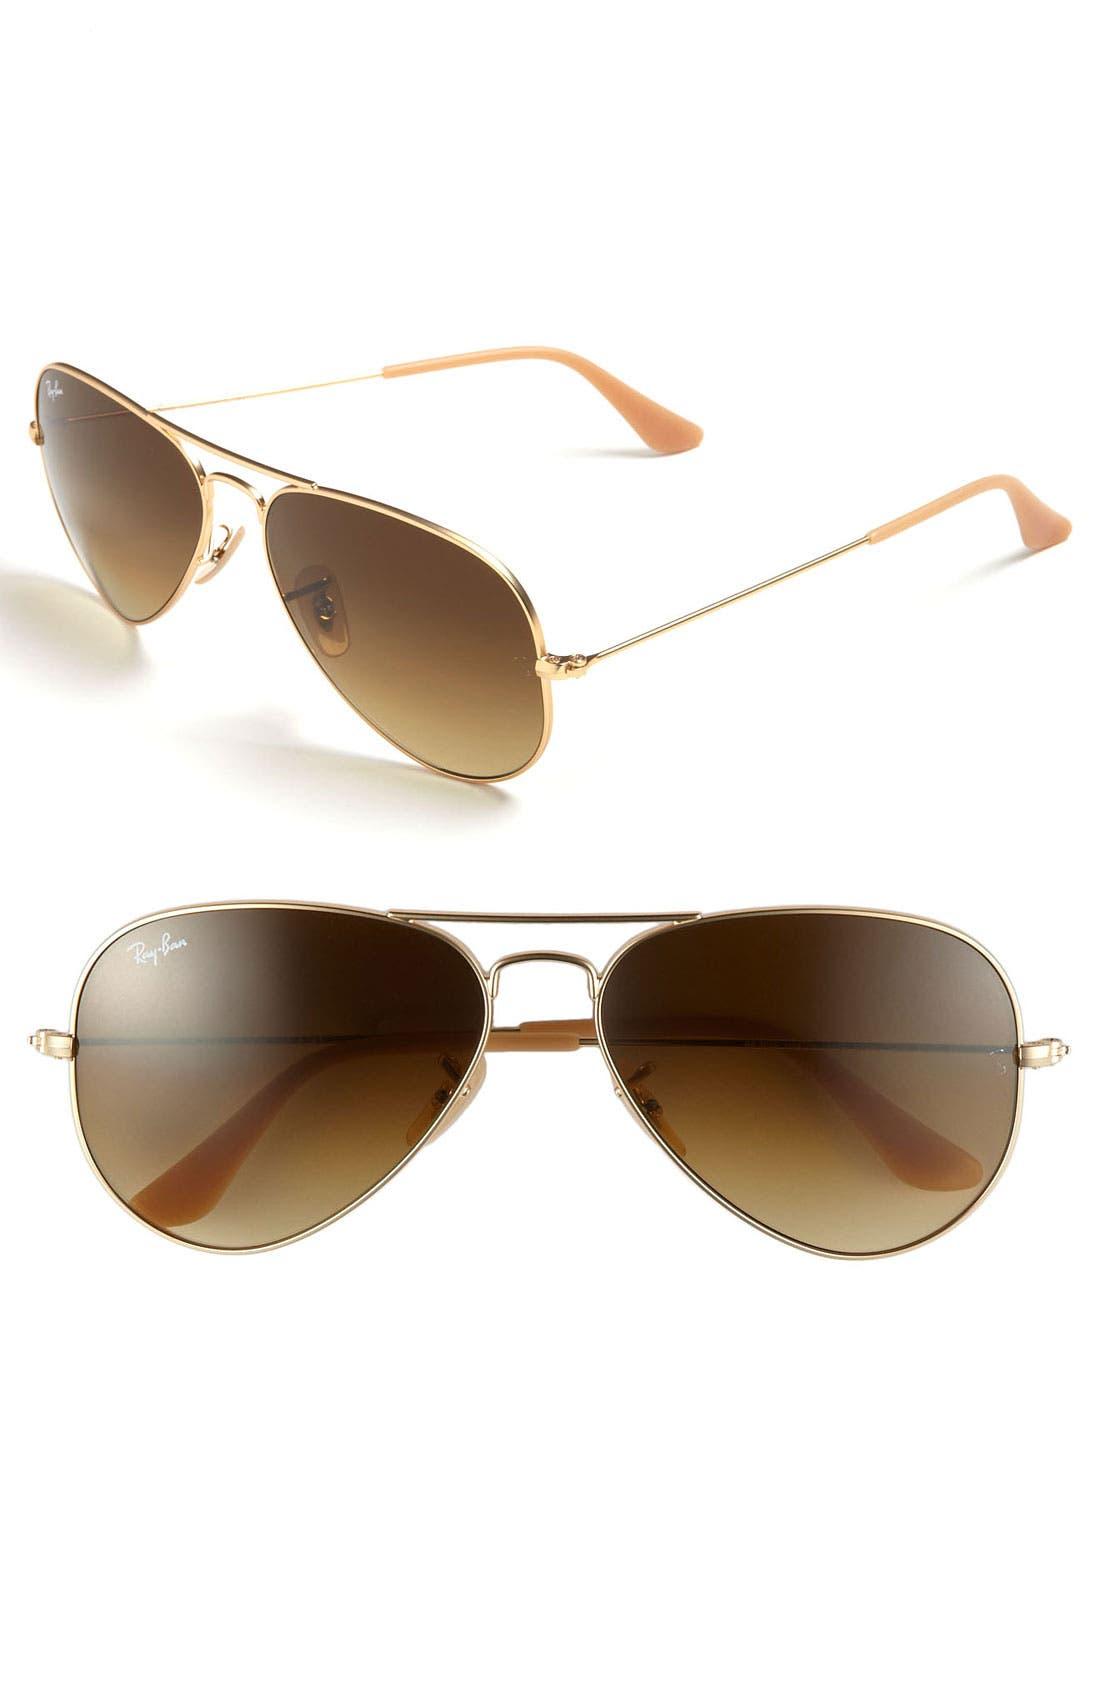 Ray-Ban Standard Original 5m Aviator Sunglasses - Brown